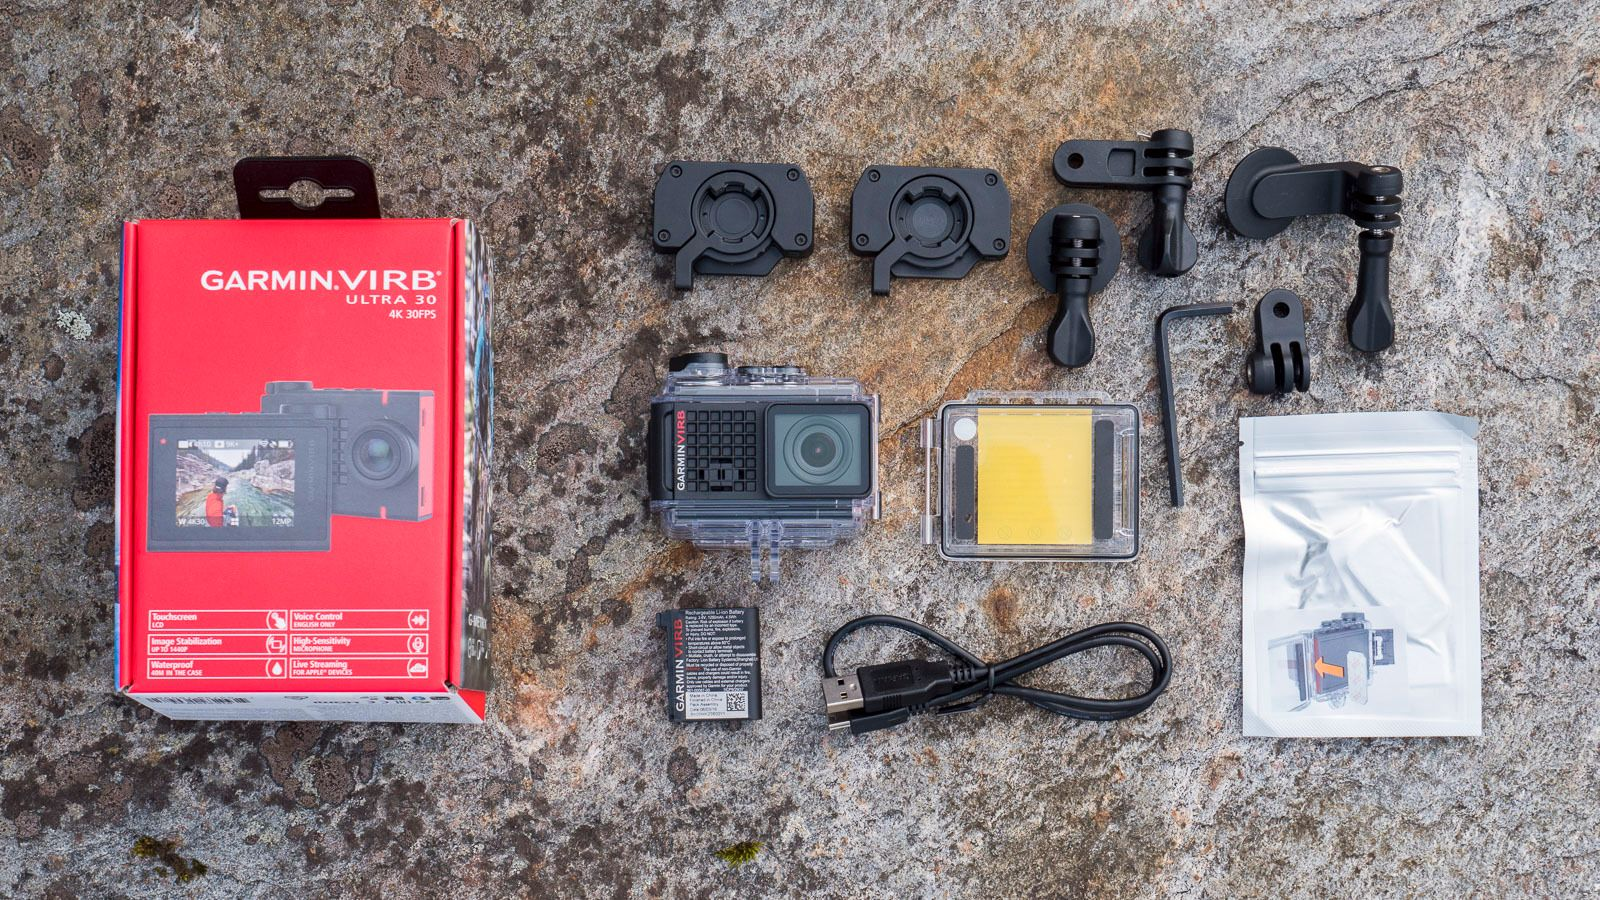 Garmins egne fester er gode, men hvis du allerede har GoPro-utstyr skal kameraet fungere fint med det også.